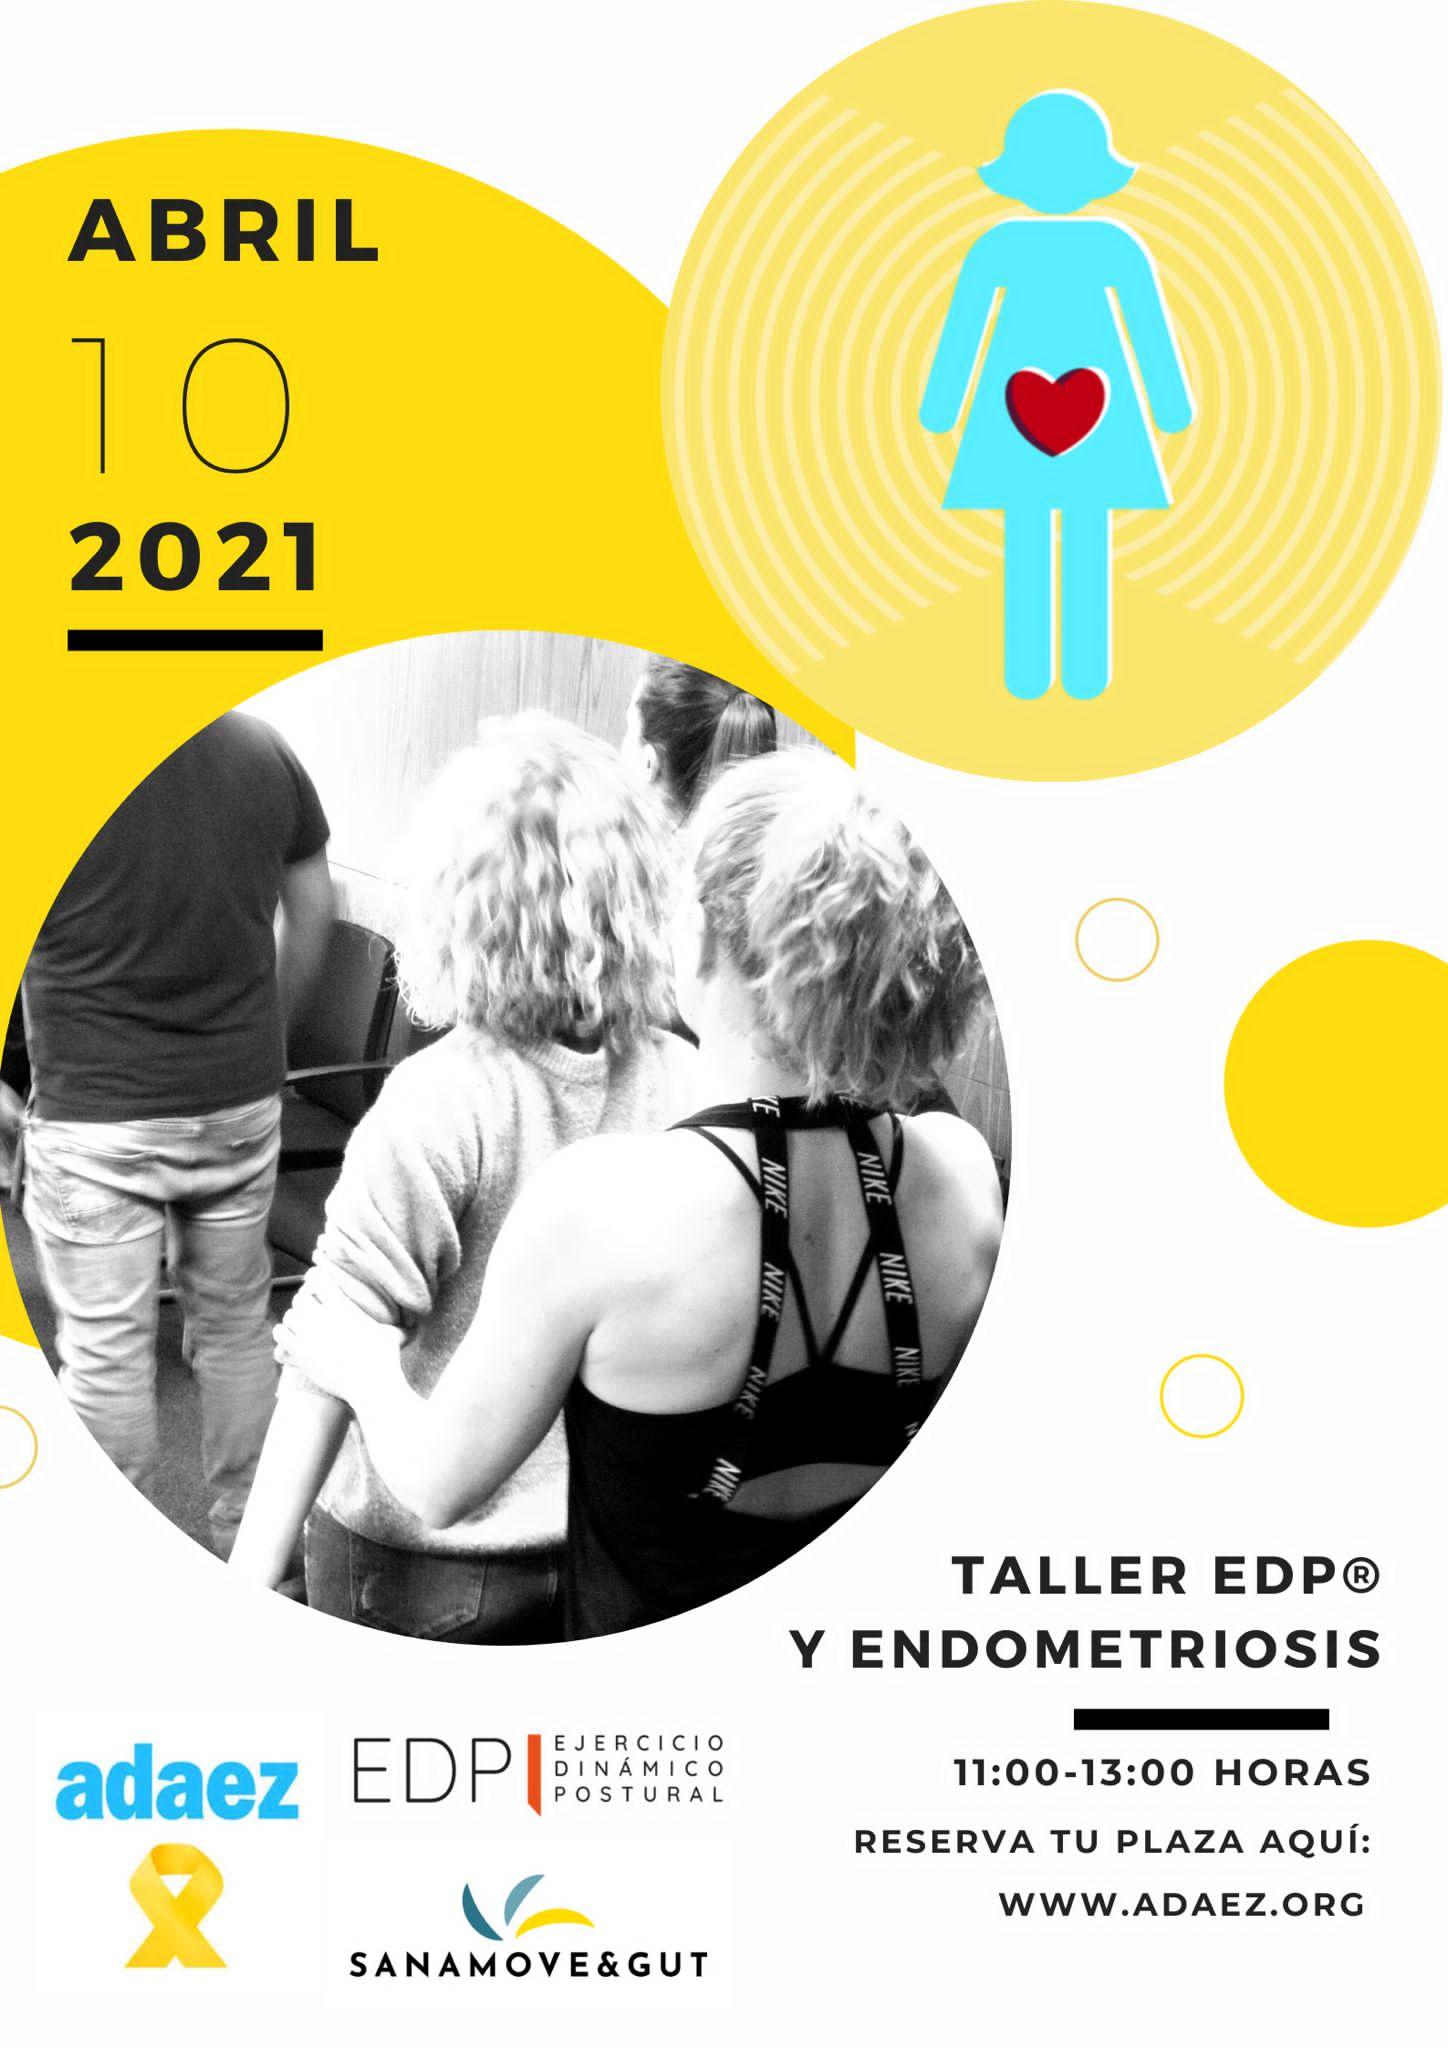 taller.edp.Endometriosis.adaez